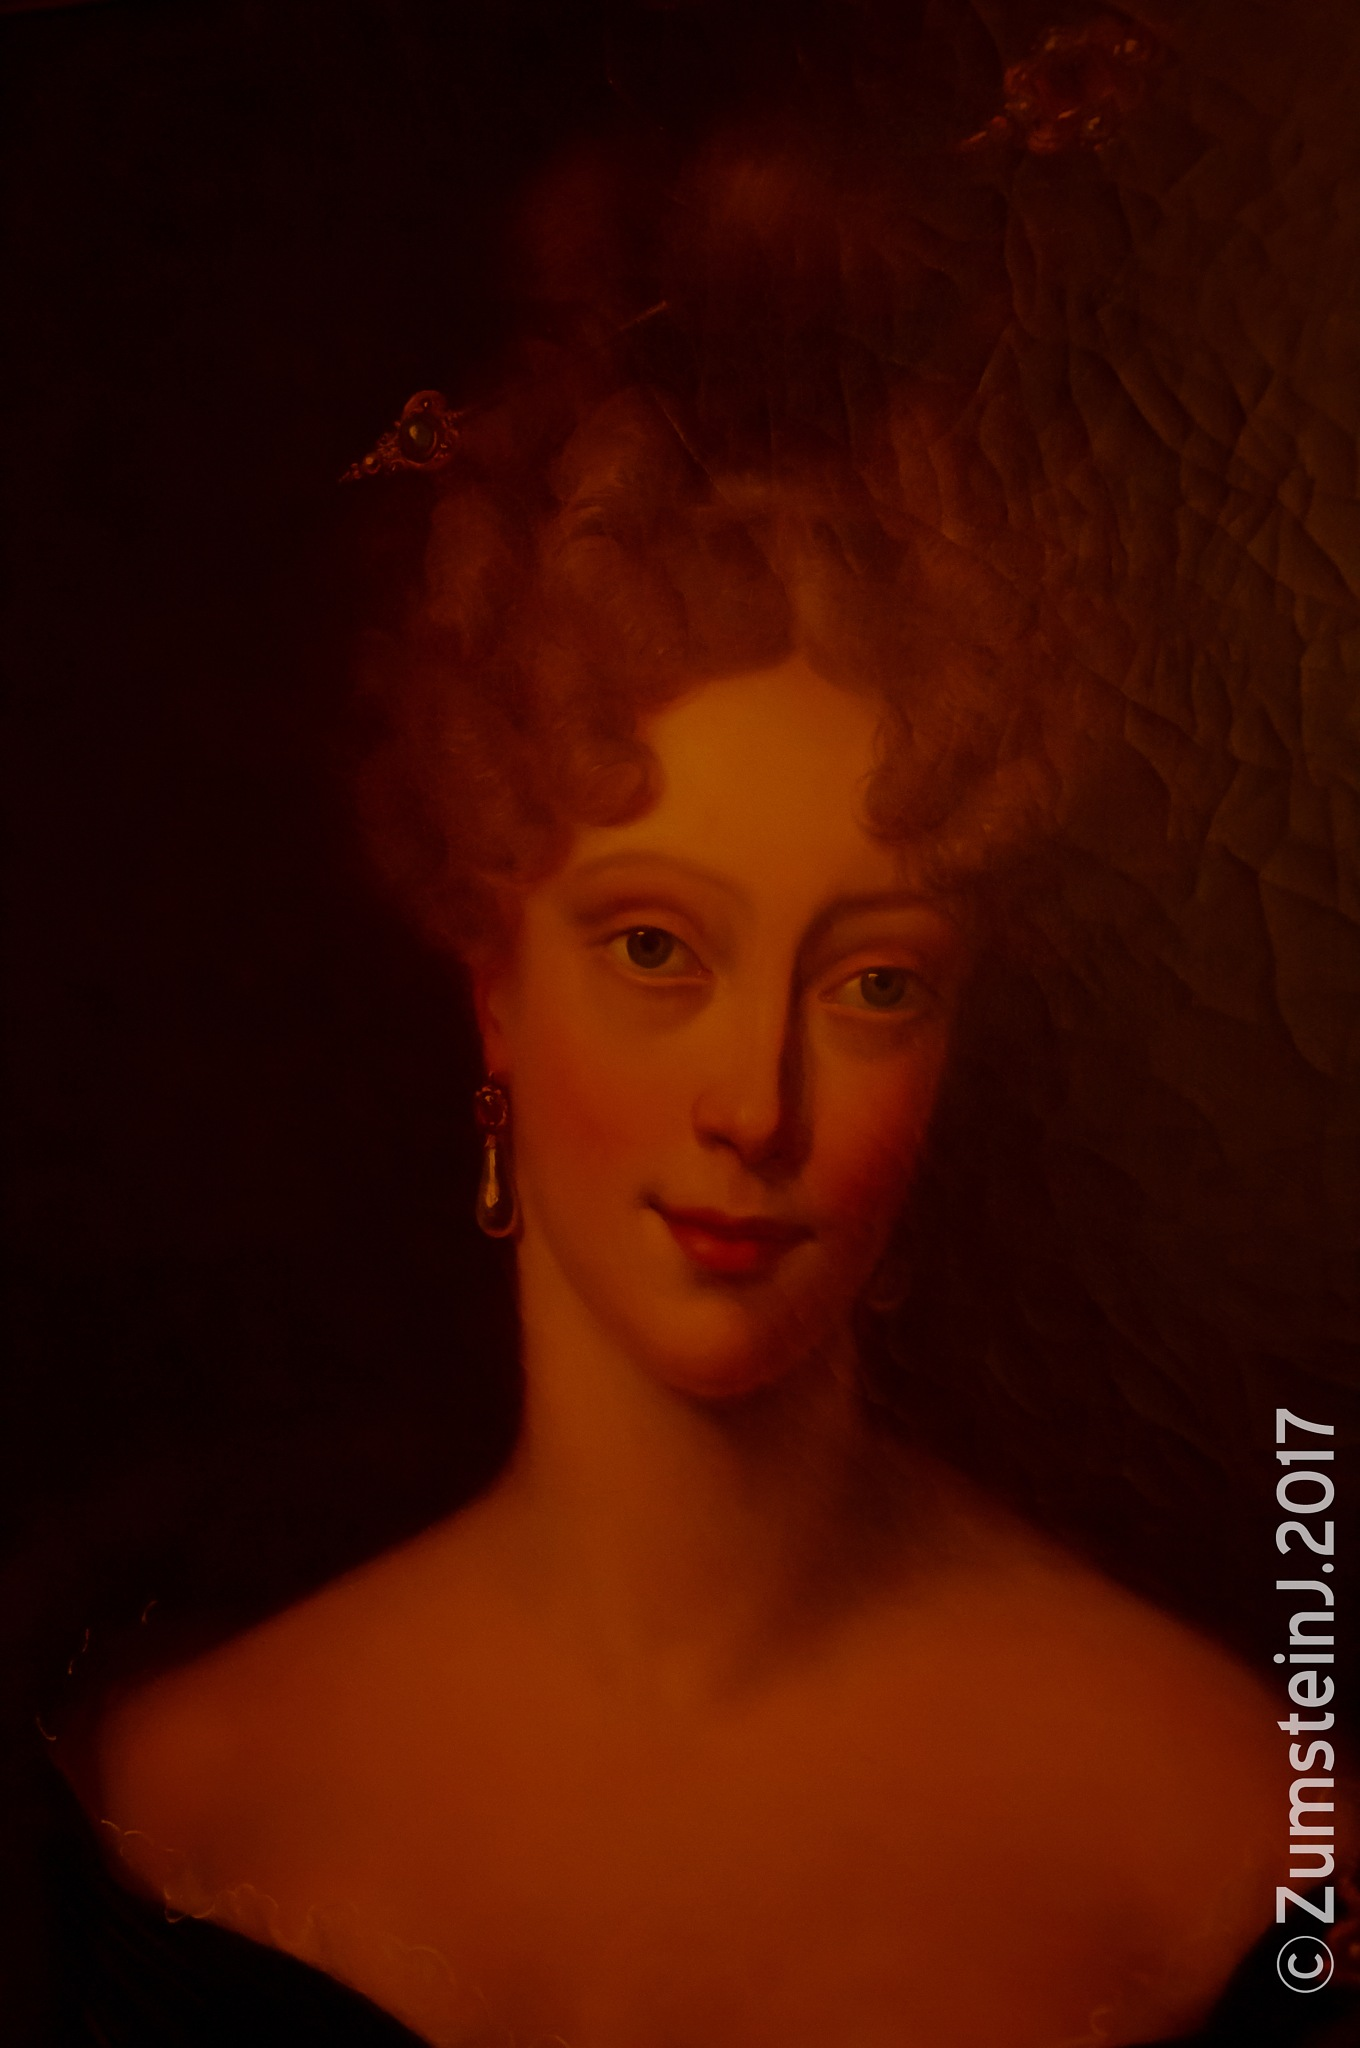 La comtesse Du Barry by Zumstein Jacqui